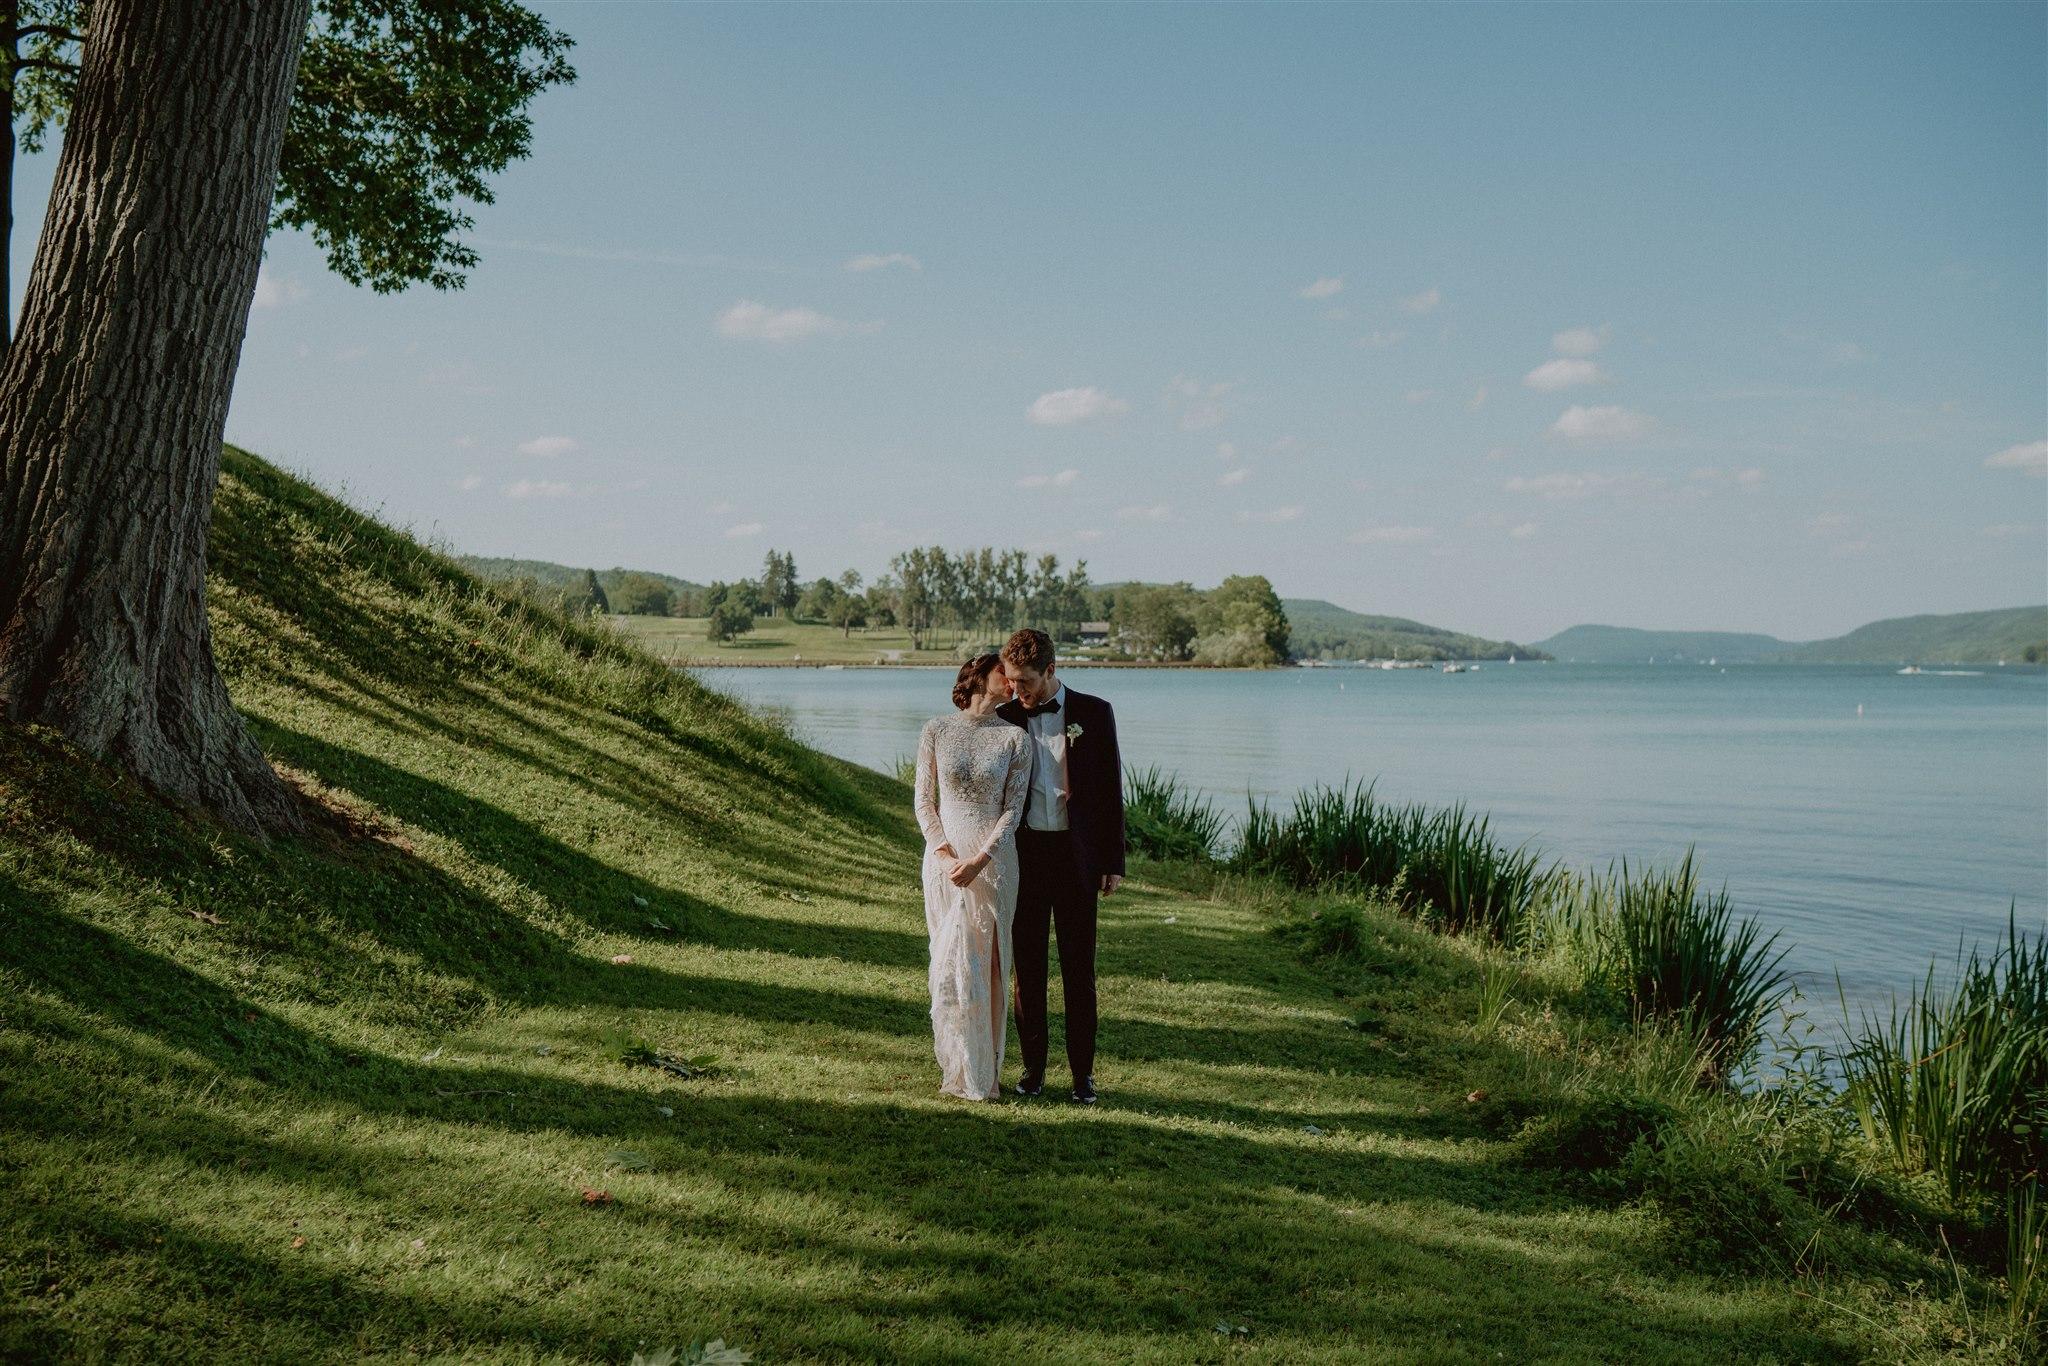 Chellise_Michael_Photography_Hudson_Valley_Wedding_Photographer_Otesaga_Hotel-4046.jpg